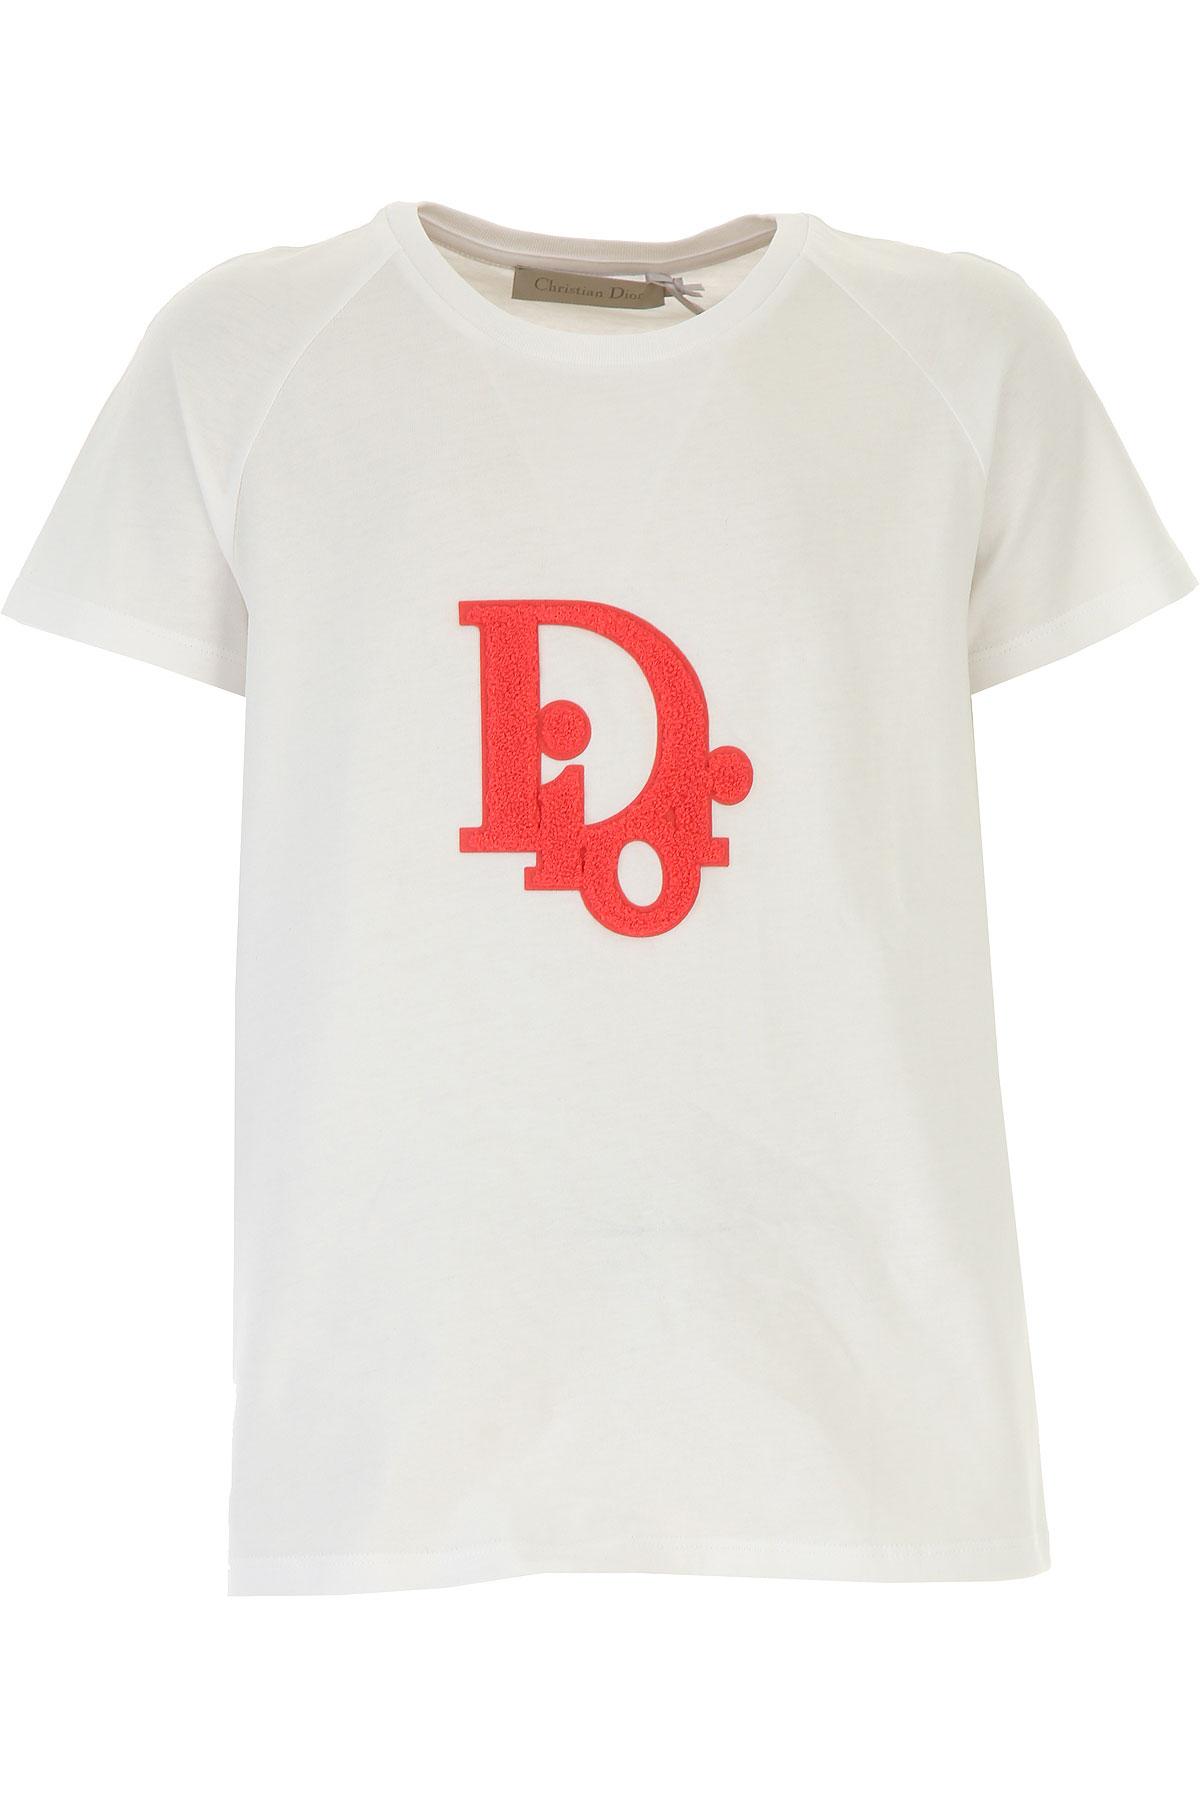 Christian Dior Kids T-Shirt for Girls On Sale, White, Cotton, 2019, 10Y 4Y 6Y 8Y